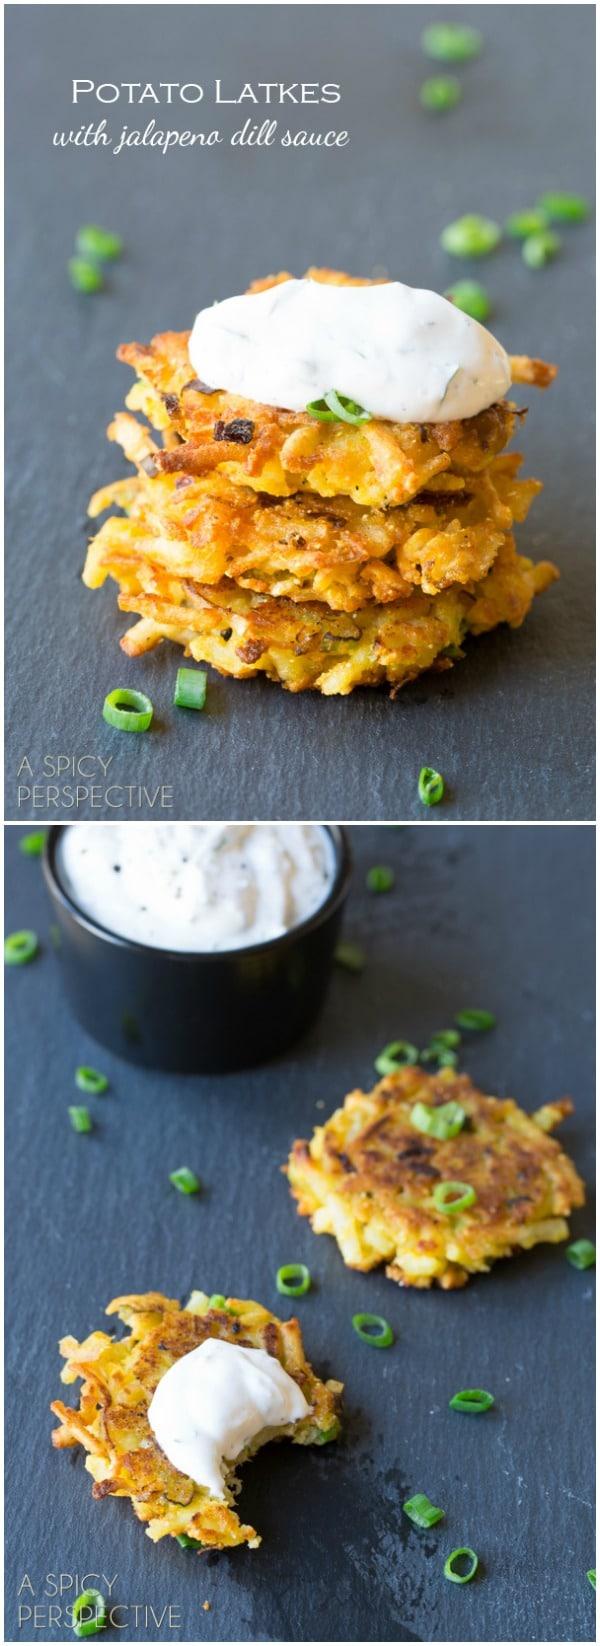 Warm Potato Latkes with Jalapeño Dill Sauce Recipe